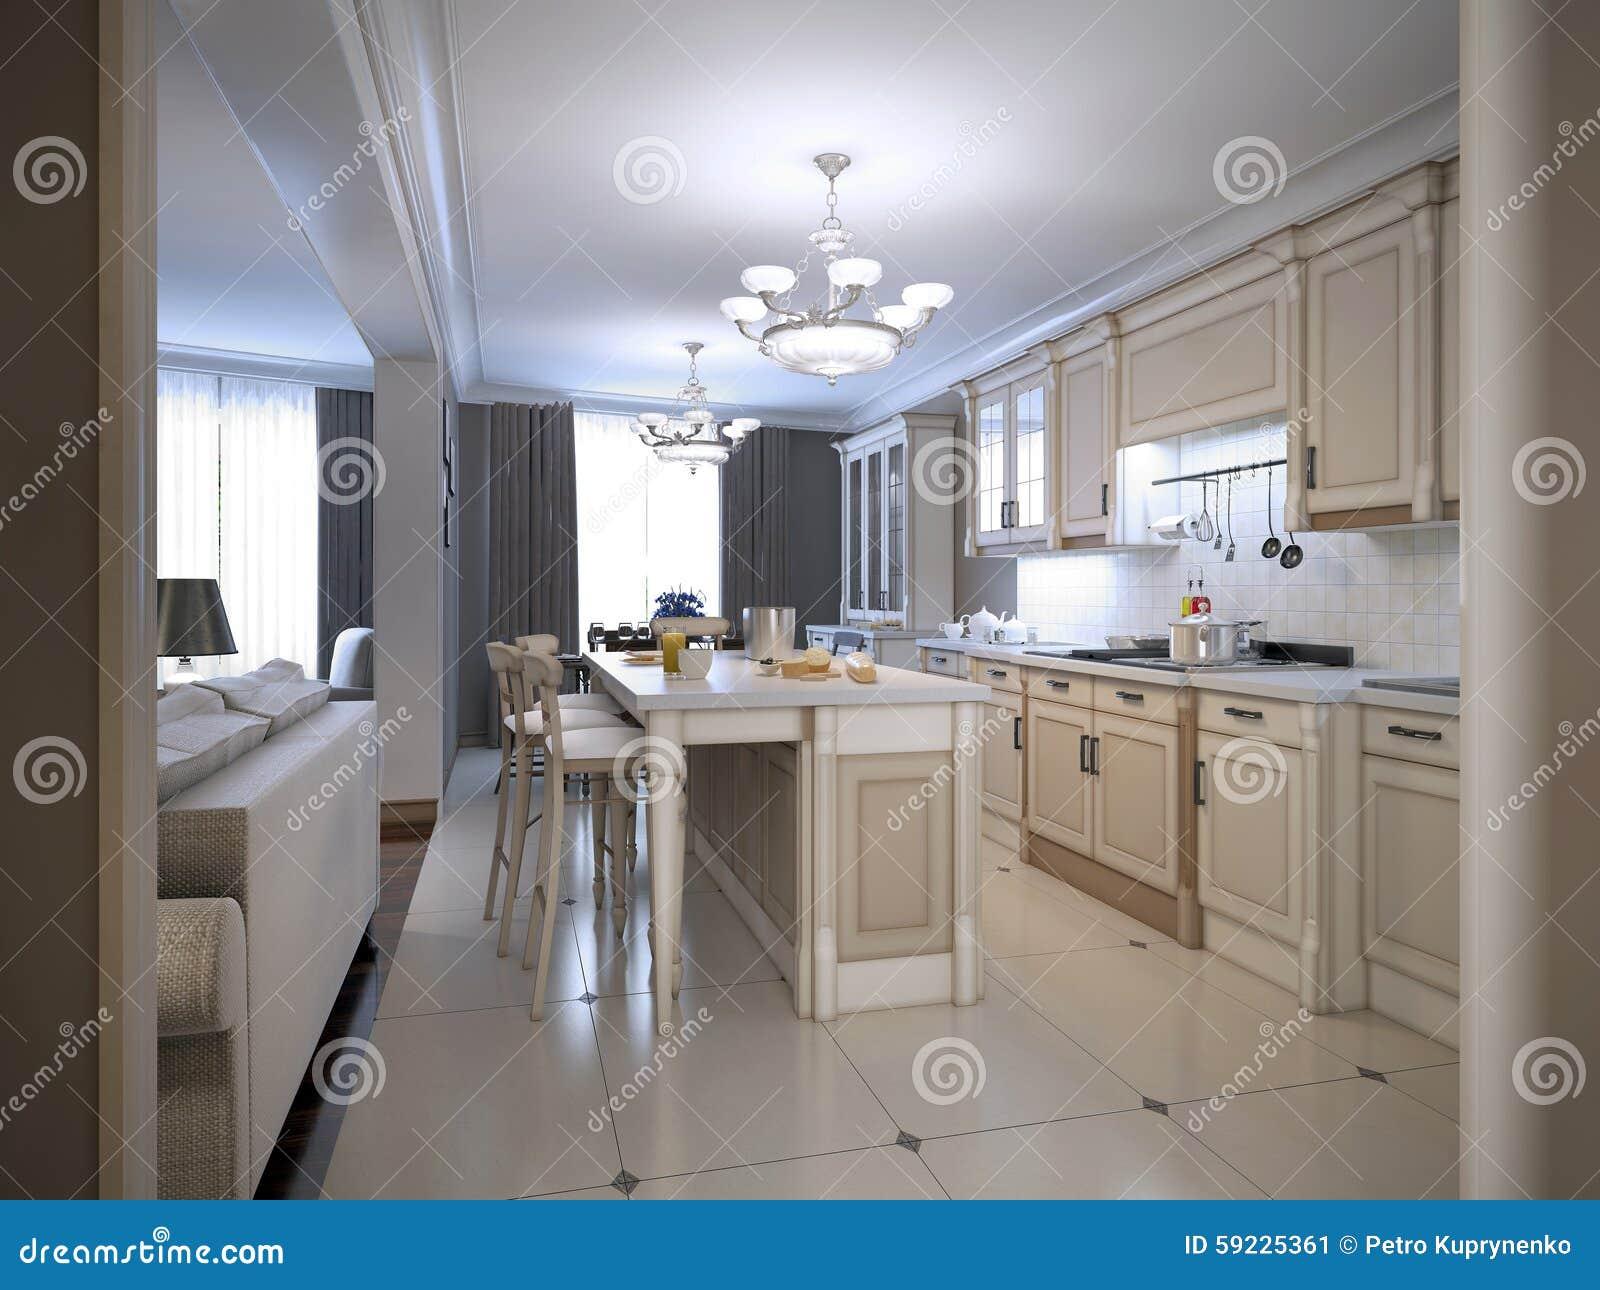 Best cucine stile provenzale offerte pictures - Cucine stile francese ...